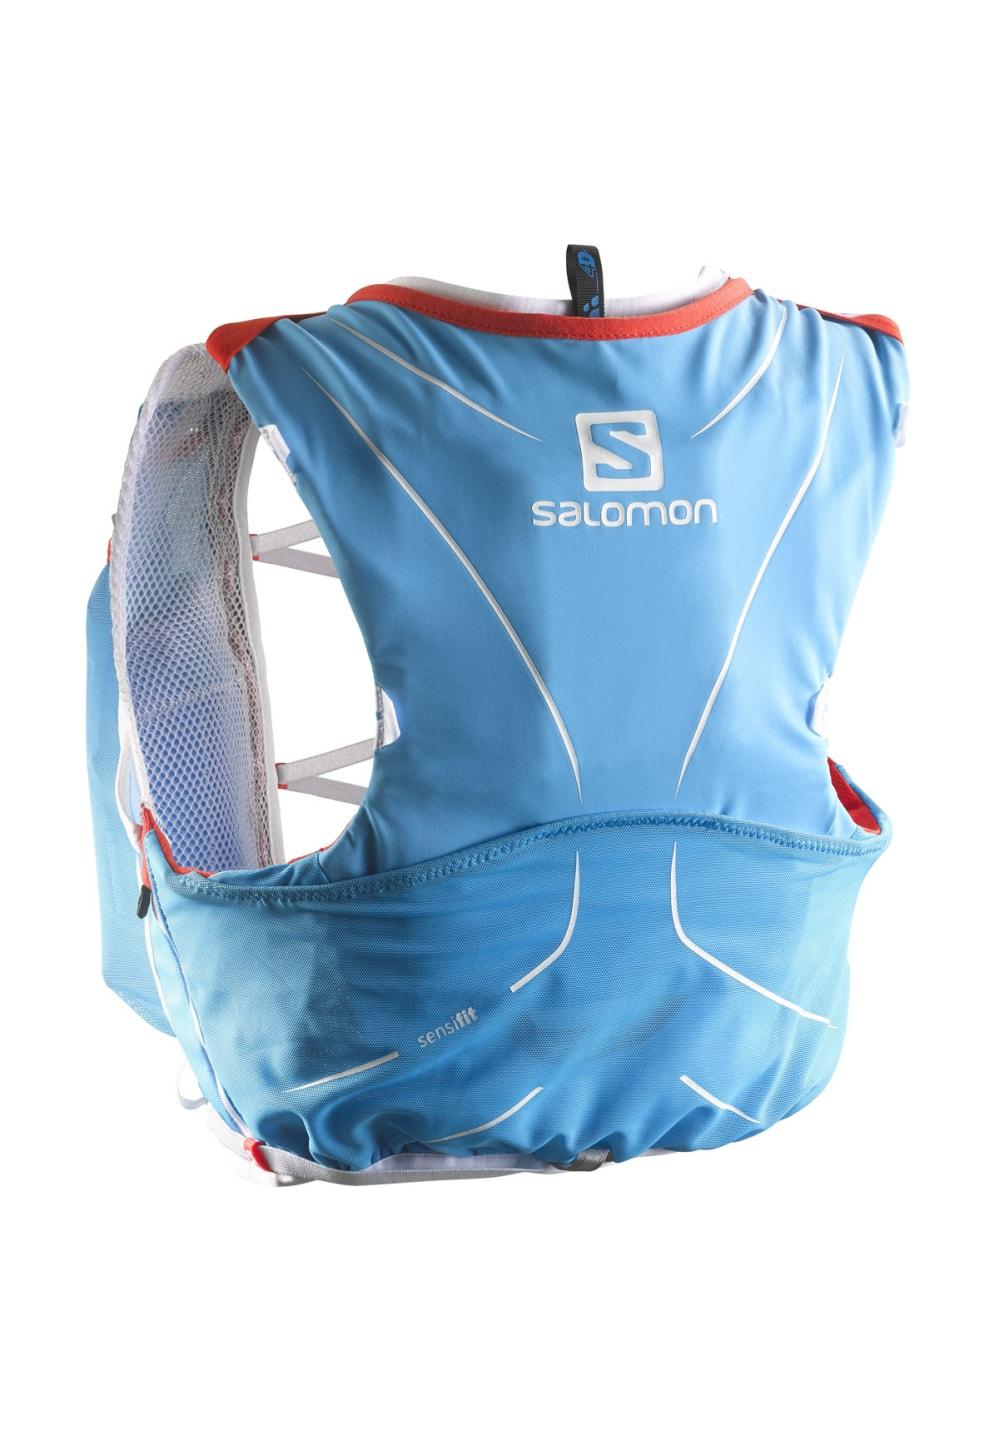 Salomon S-Lab Adv Skin3 5 Set Rucksäcke - Blau